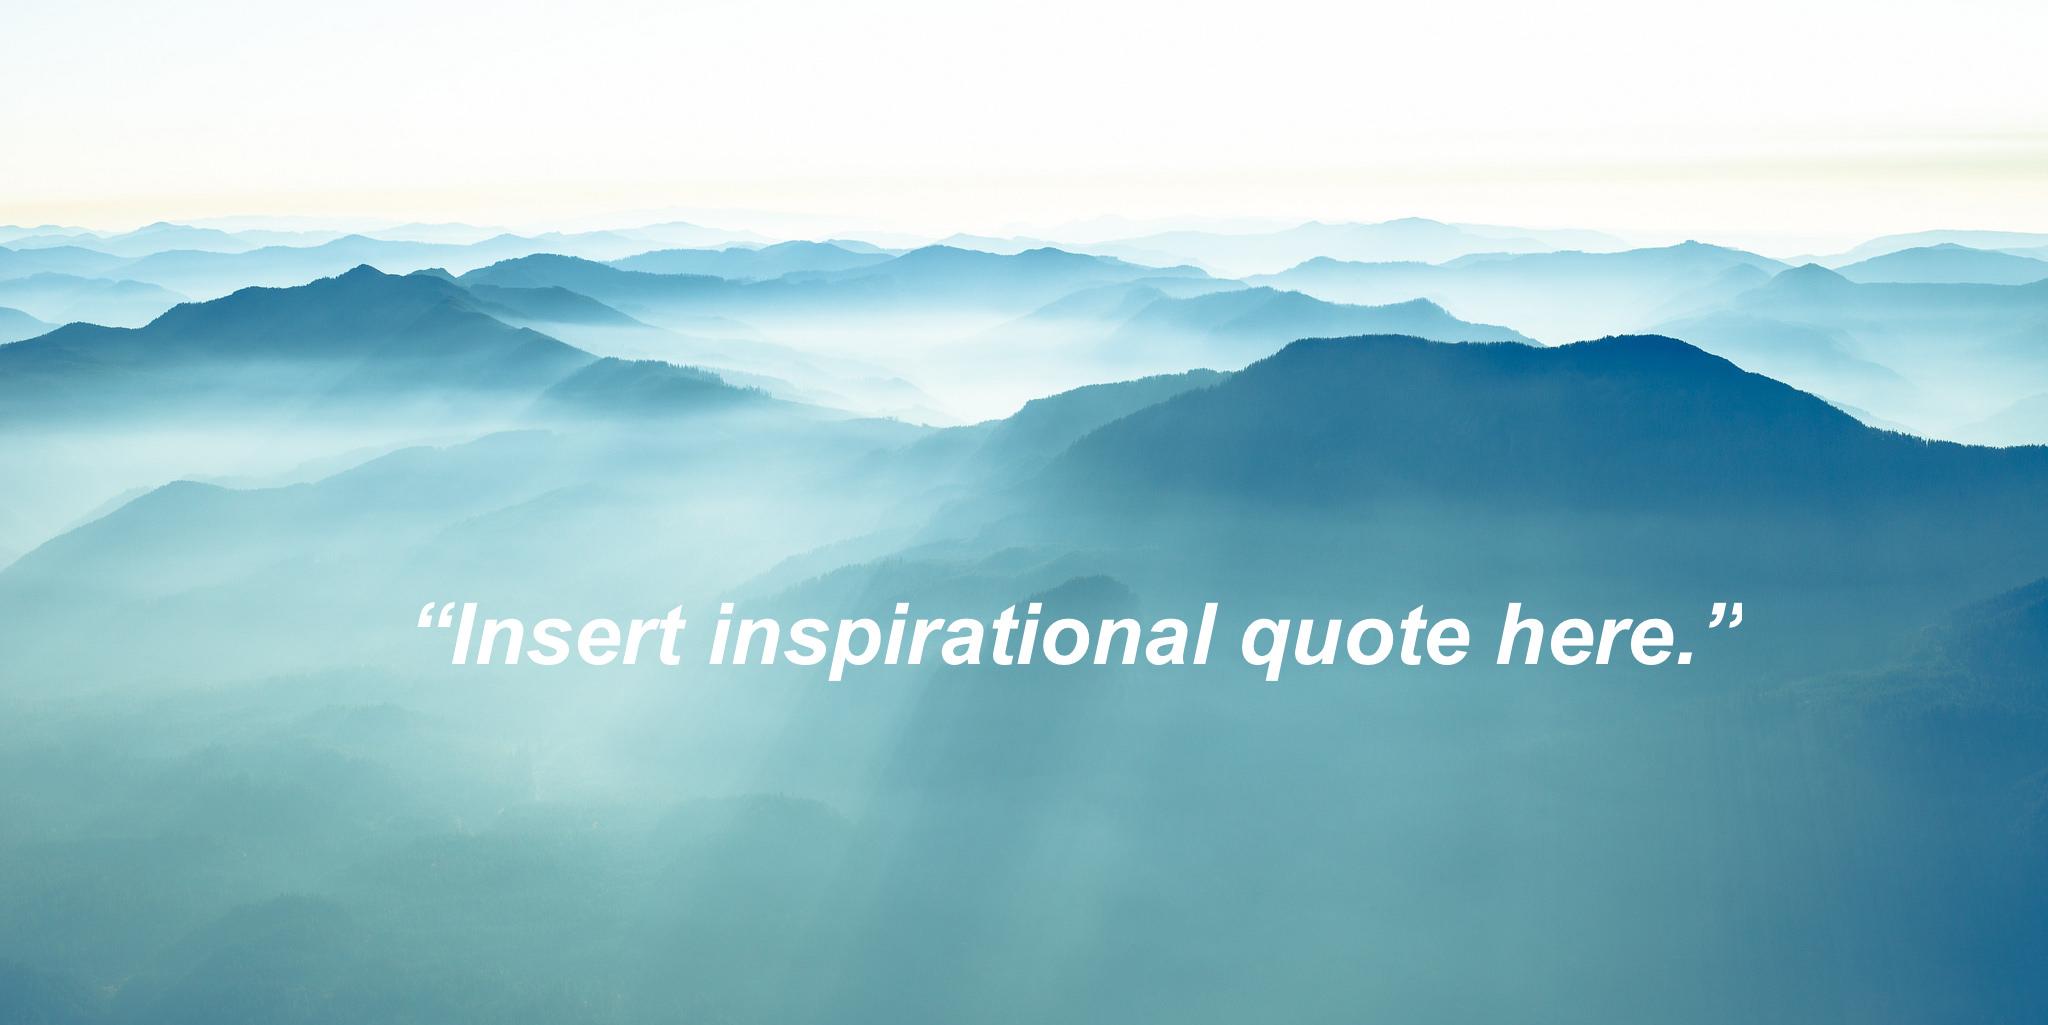 No. More. Inspirational. Quotes.